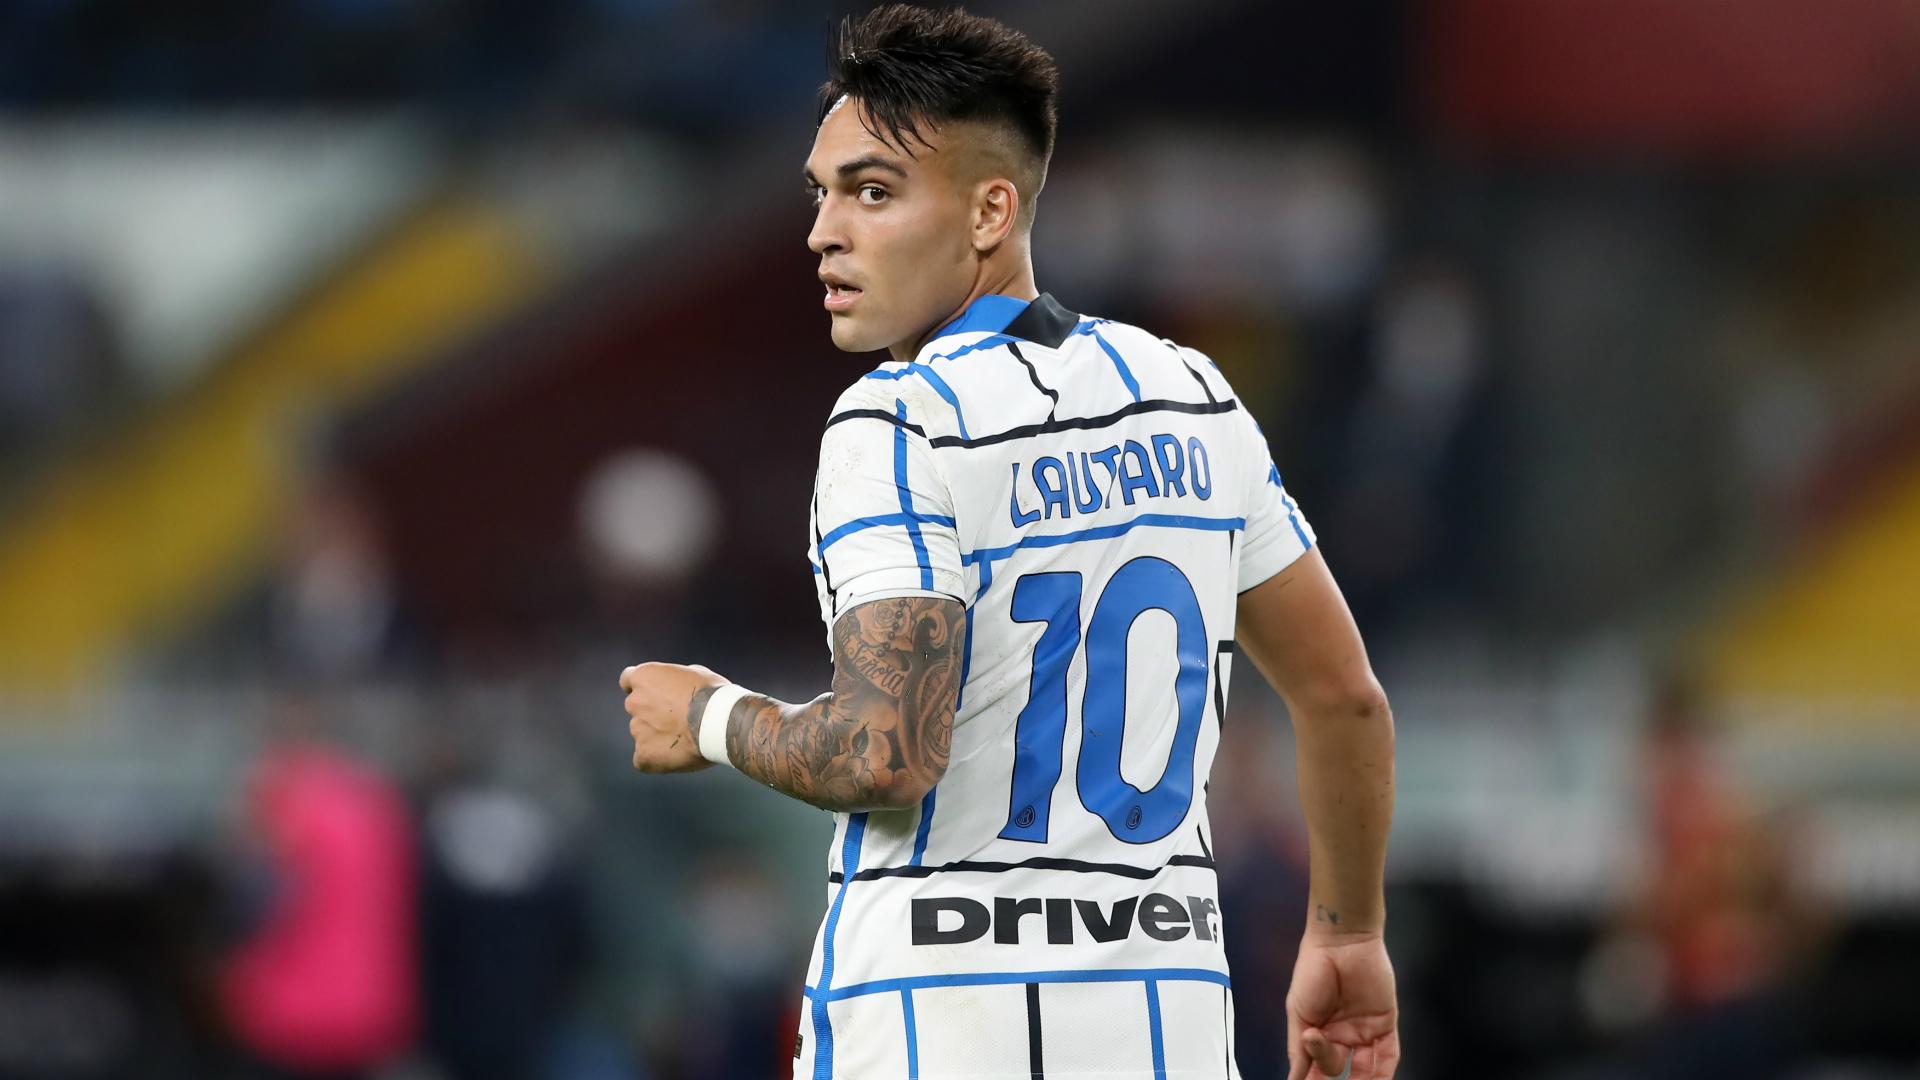 Lautaro Martinez casts doubt over long-term Inter future